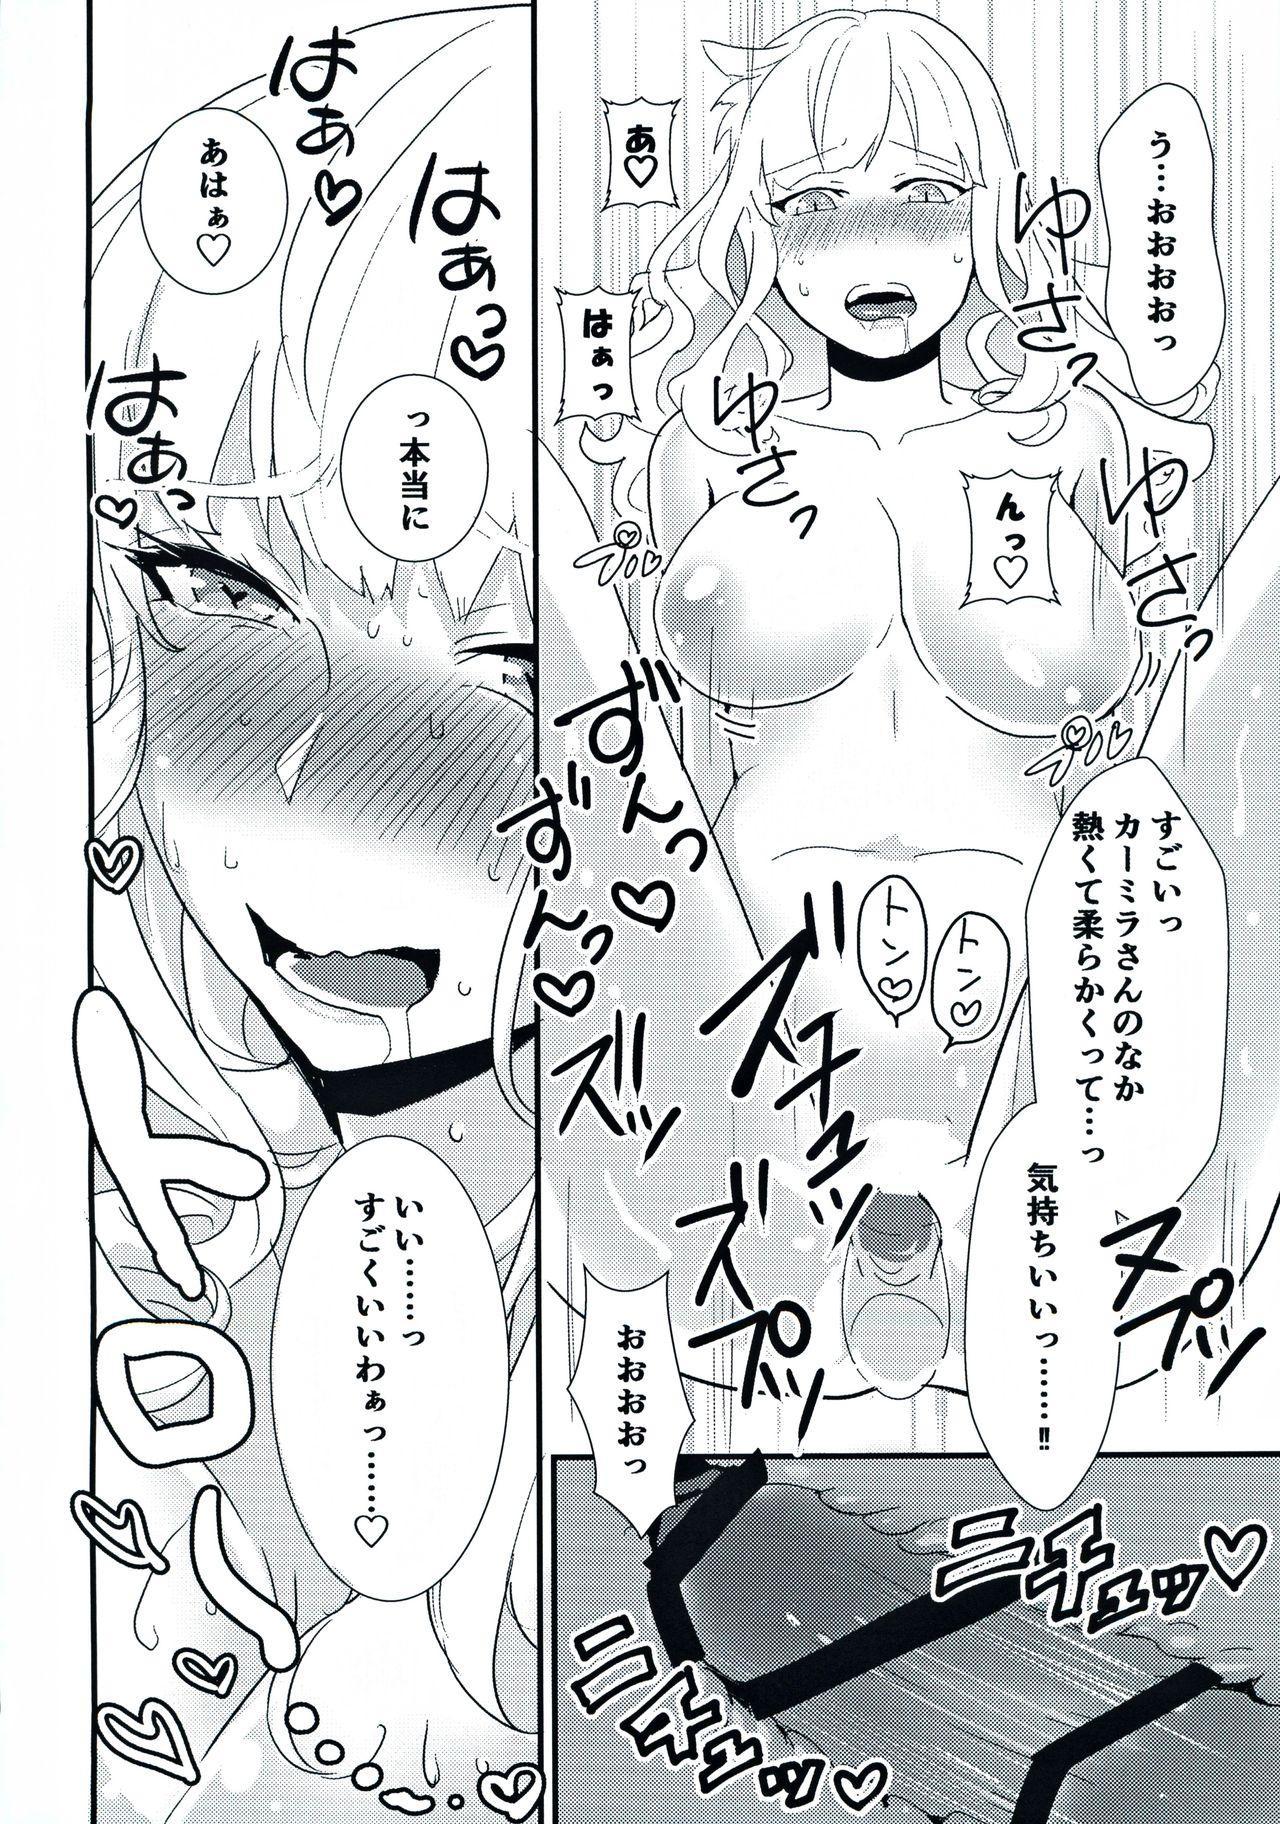 Carmilla-san to Ichaicha Shitai! 14